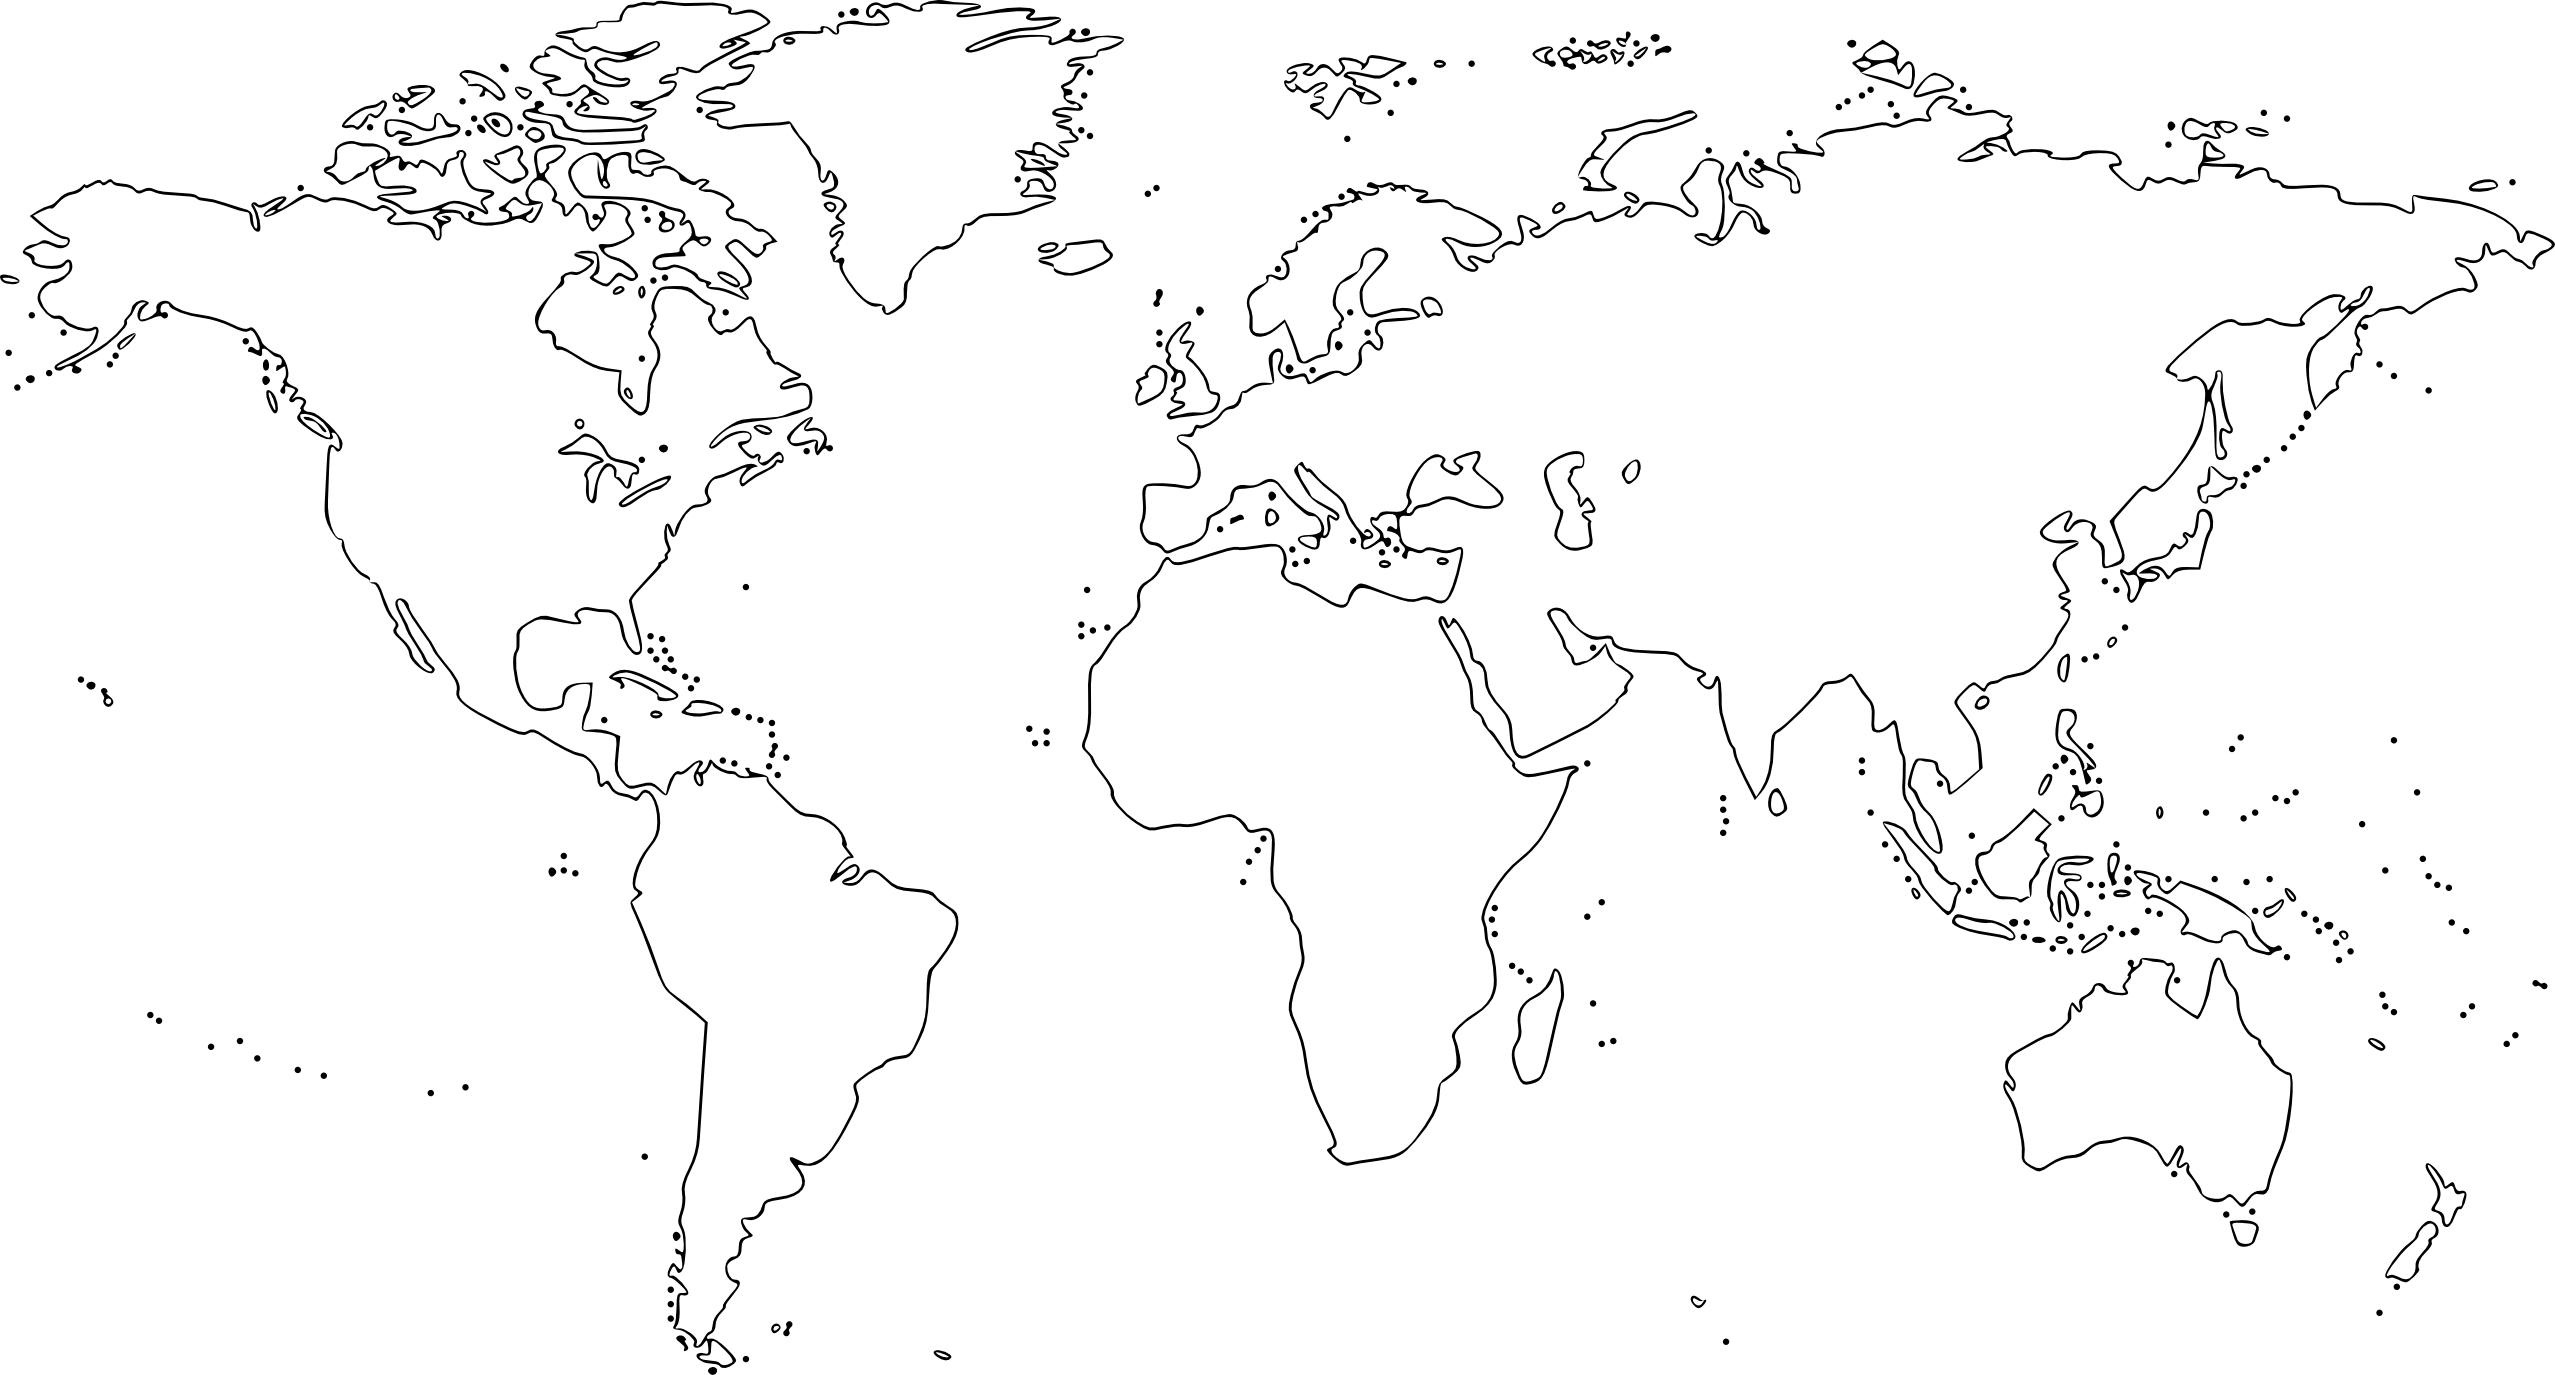 Mapa Del Mundo Para Aprender Paises